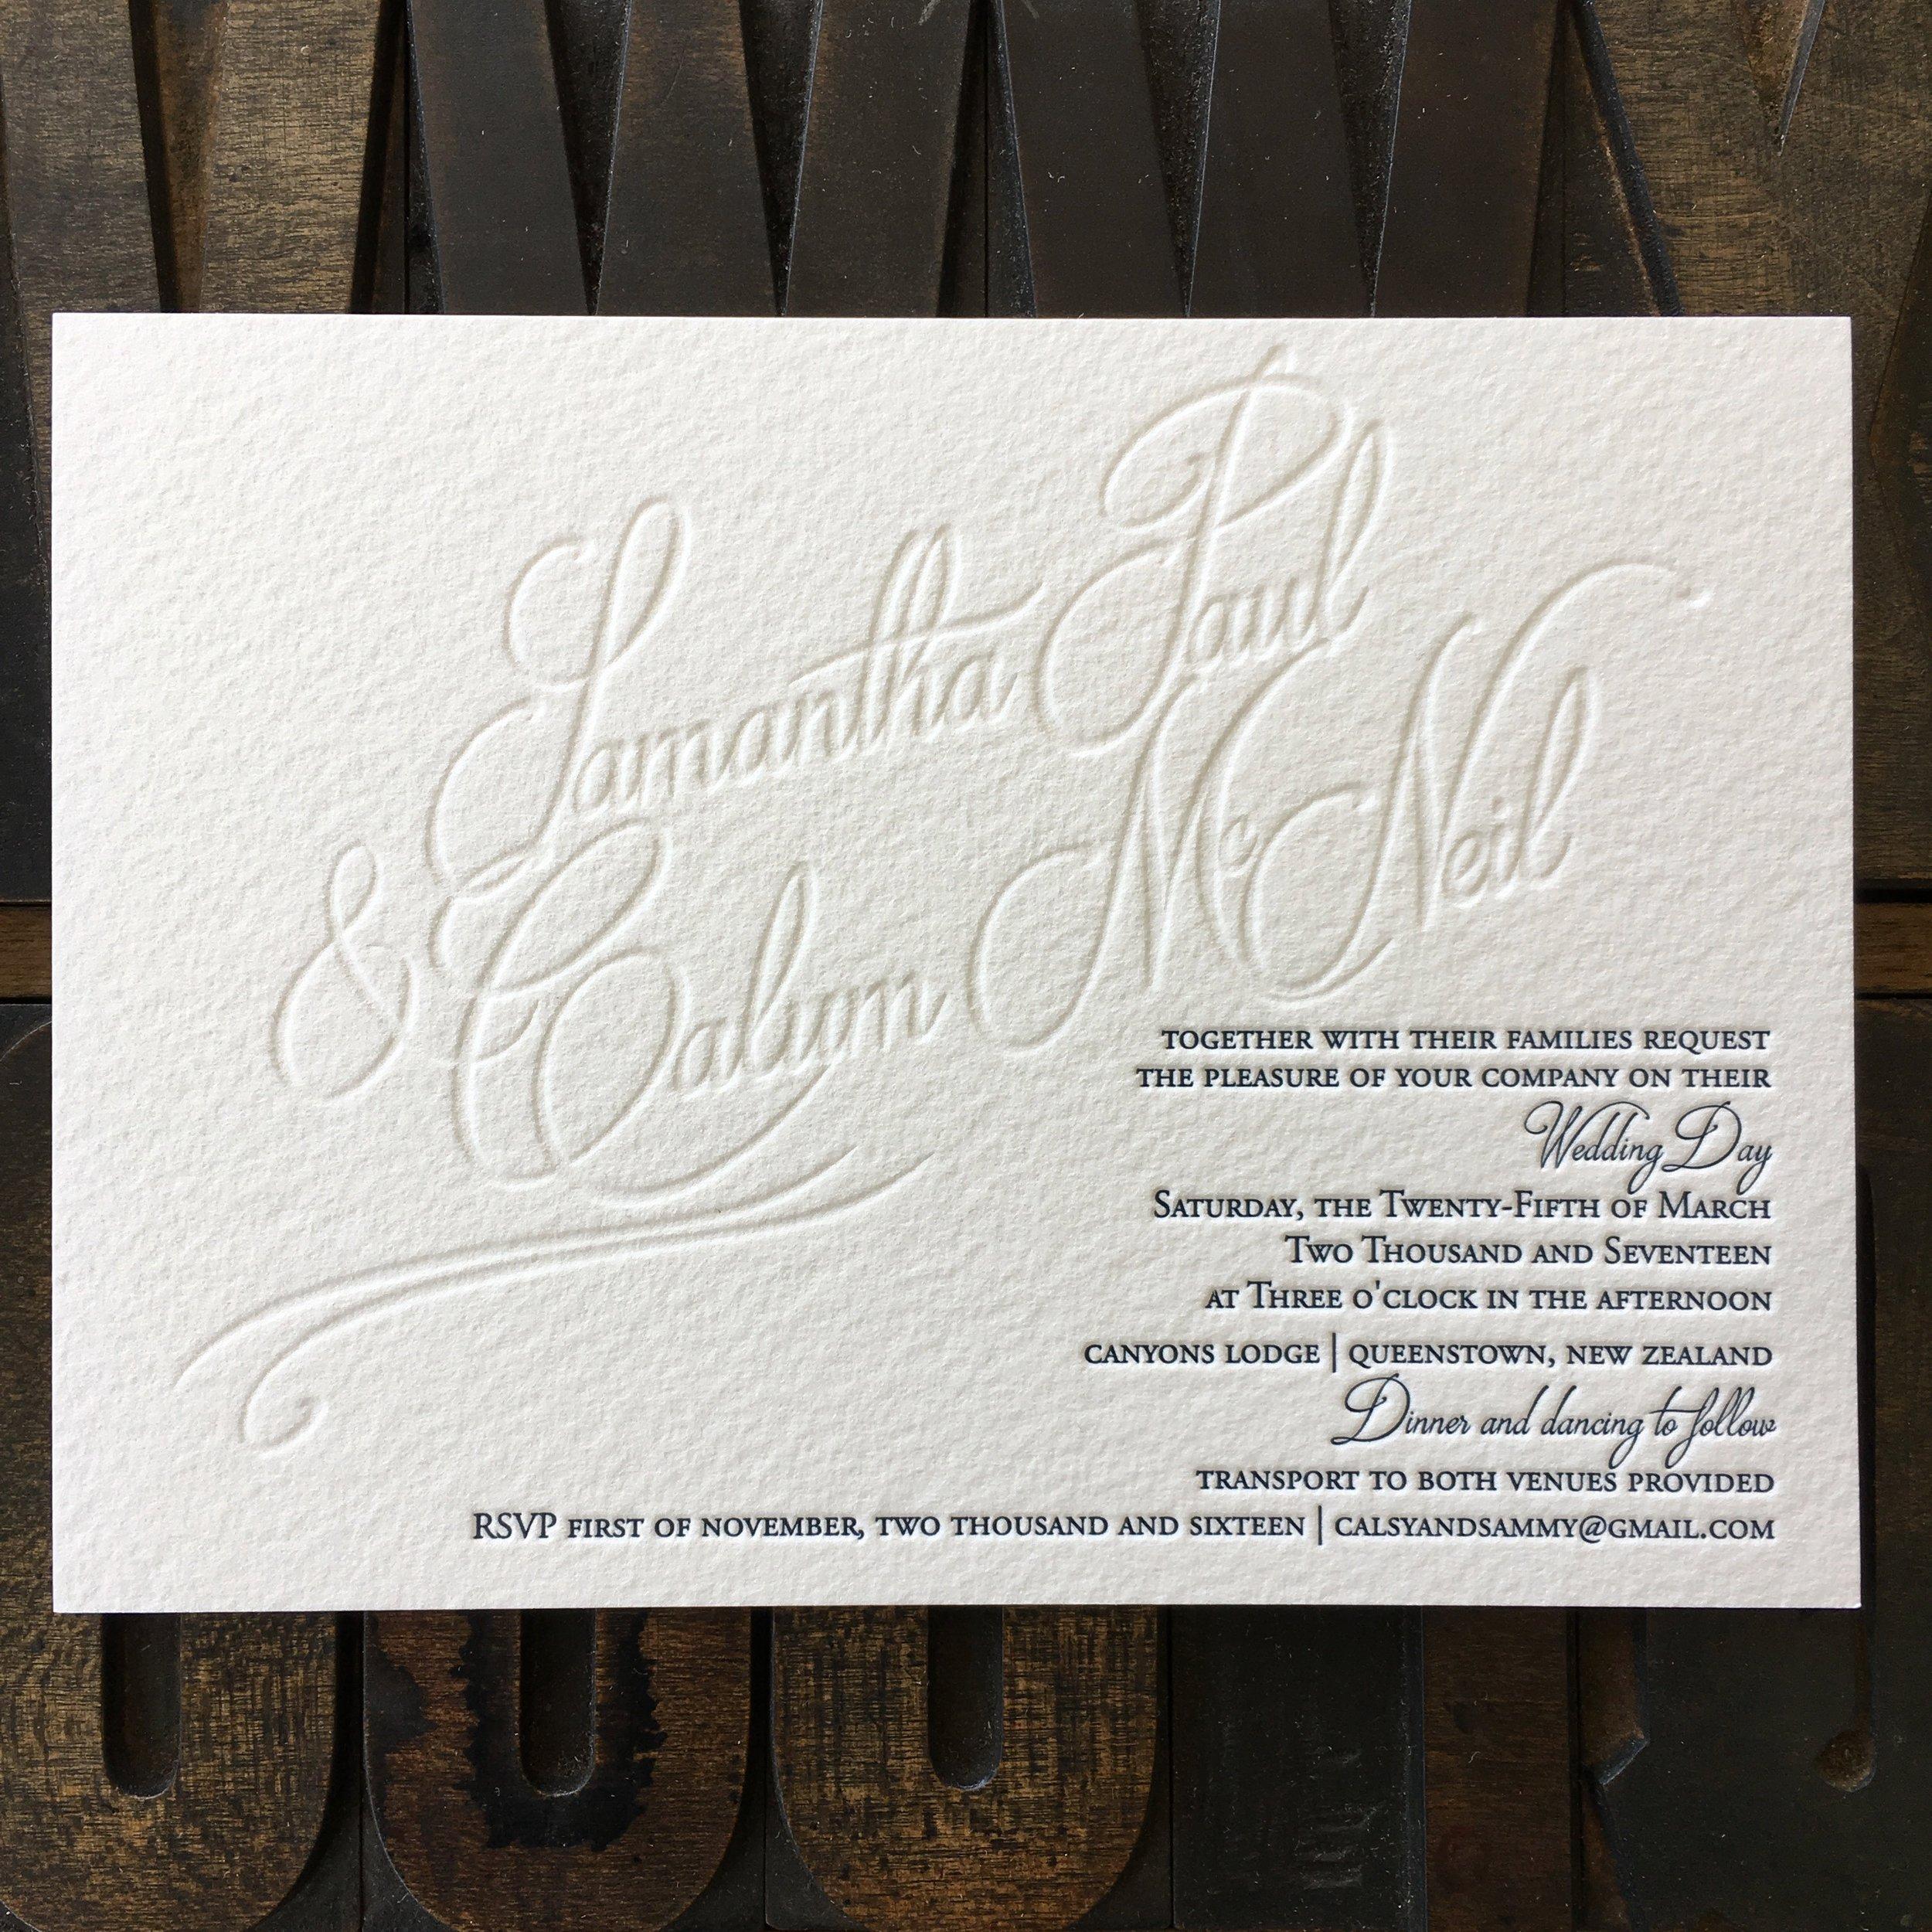 Samantha & Calum, one colour + blind letterpress print on 500gsm